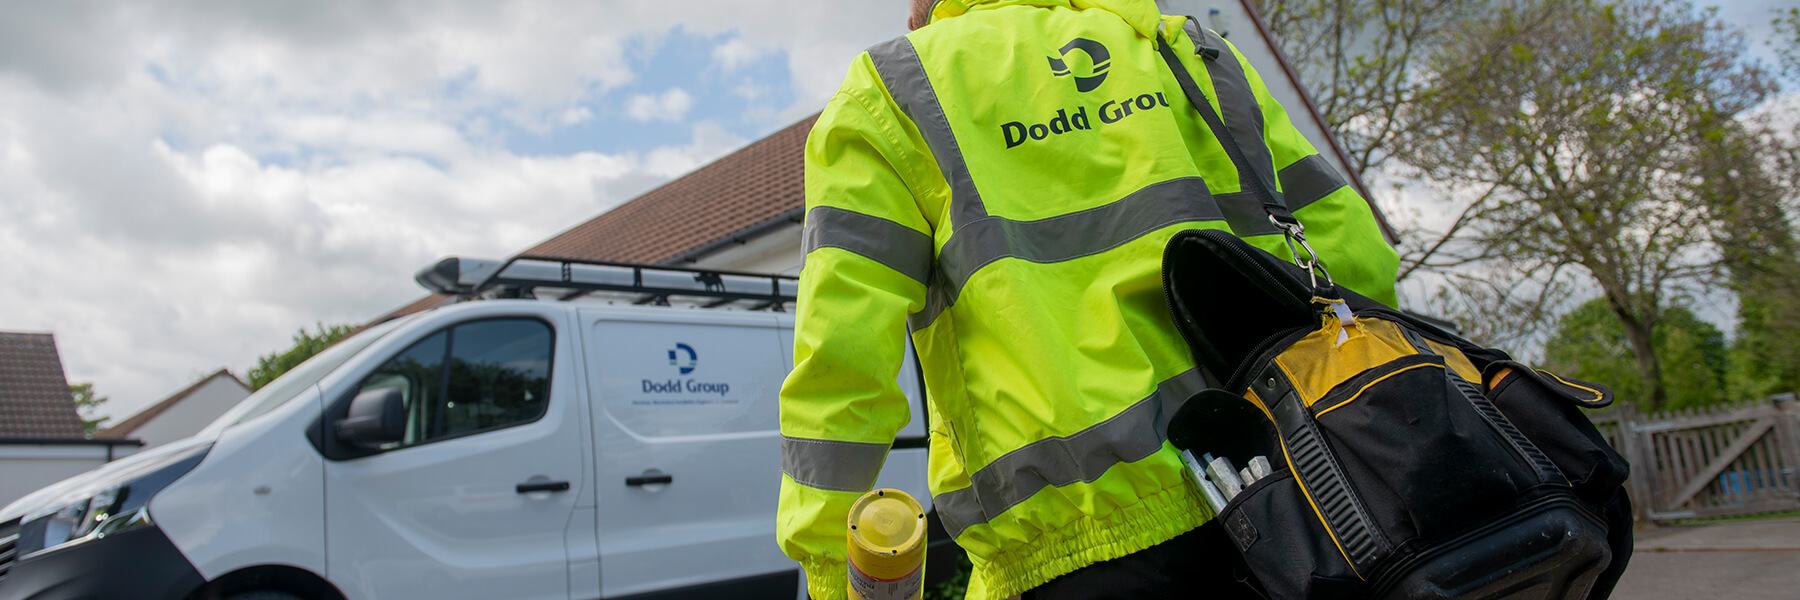 Van and man wearing high vis, Dodd group logo on both